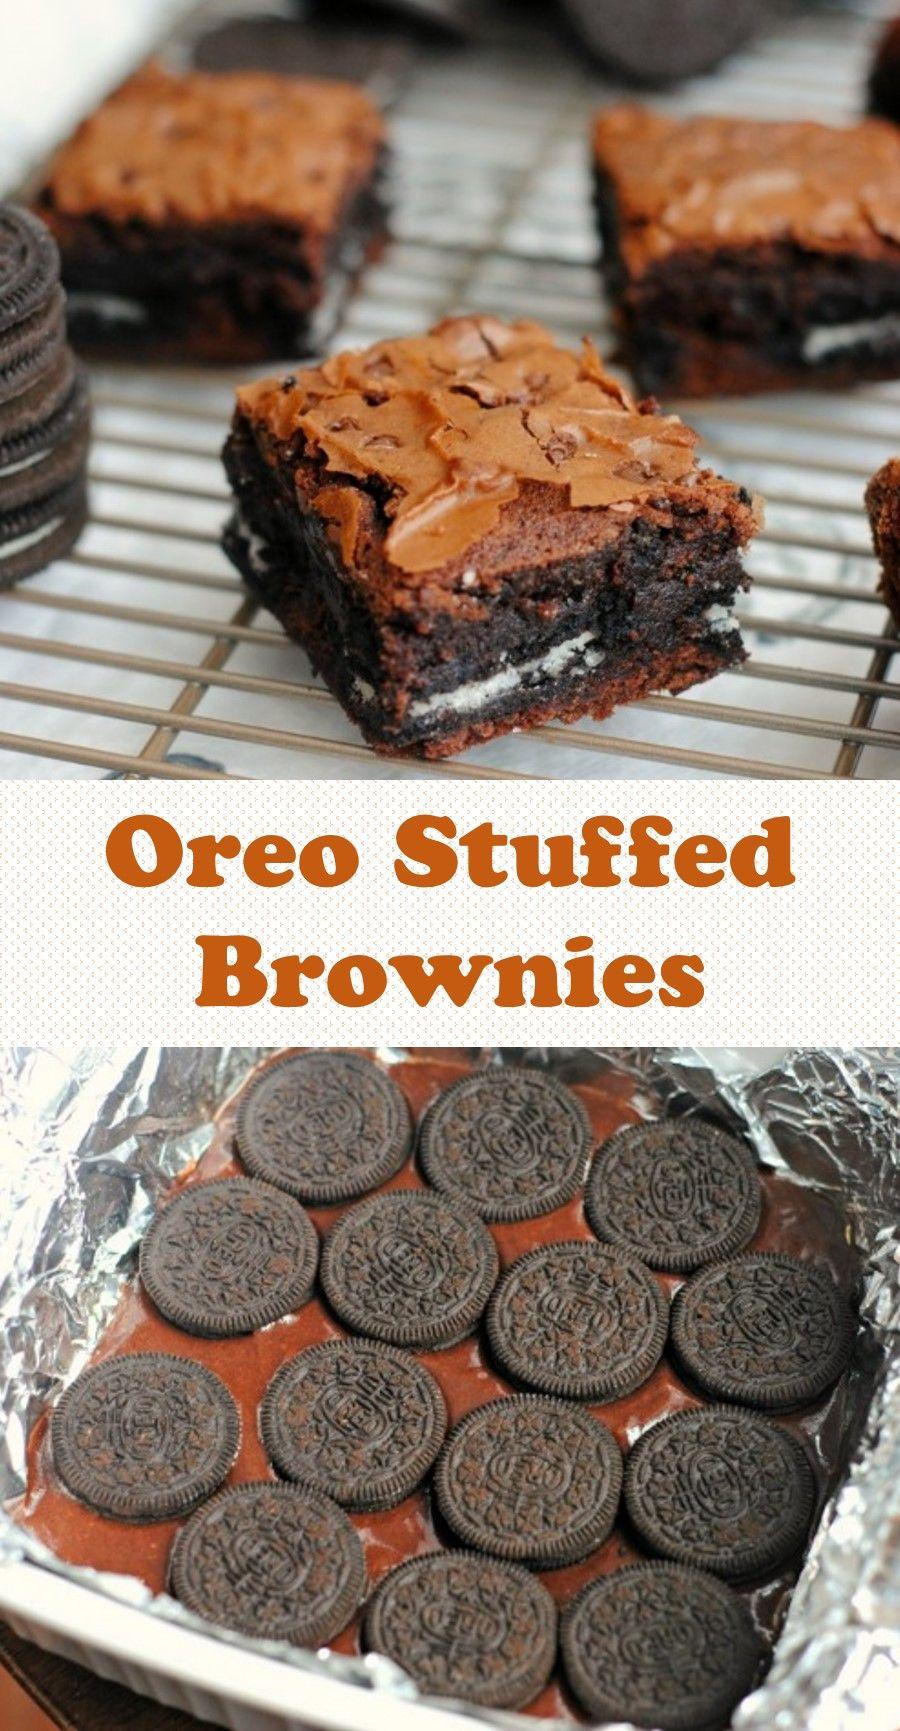 Oreo Stuffed Brownies Dairy Free Fudge Dessert Recipes Oreo